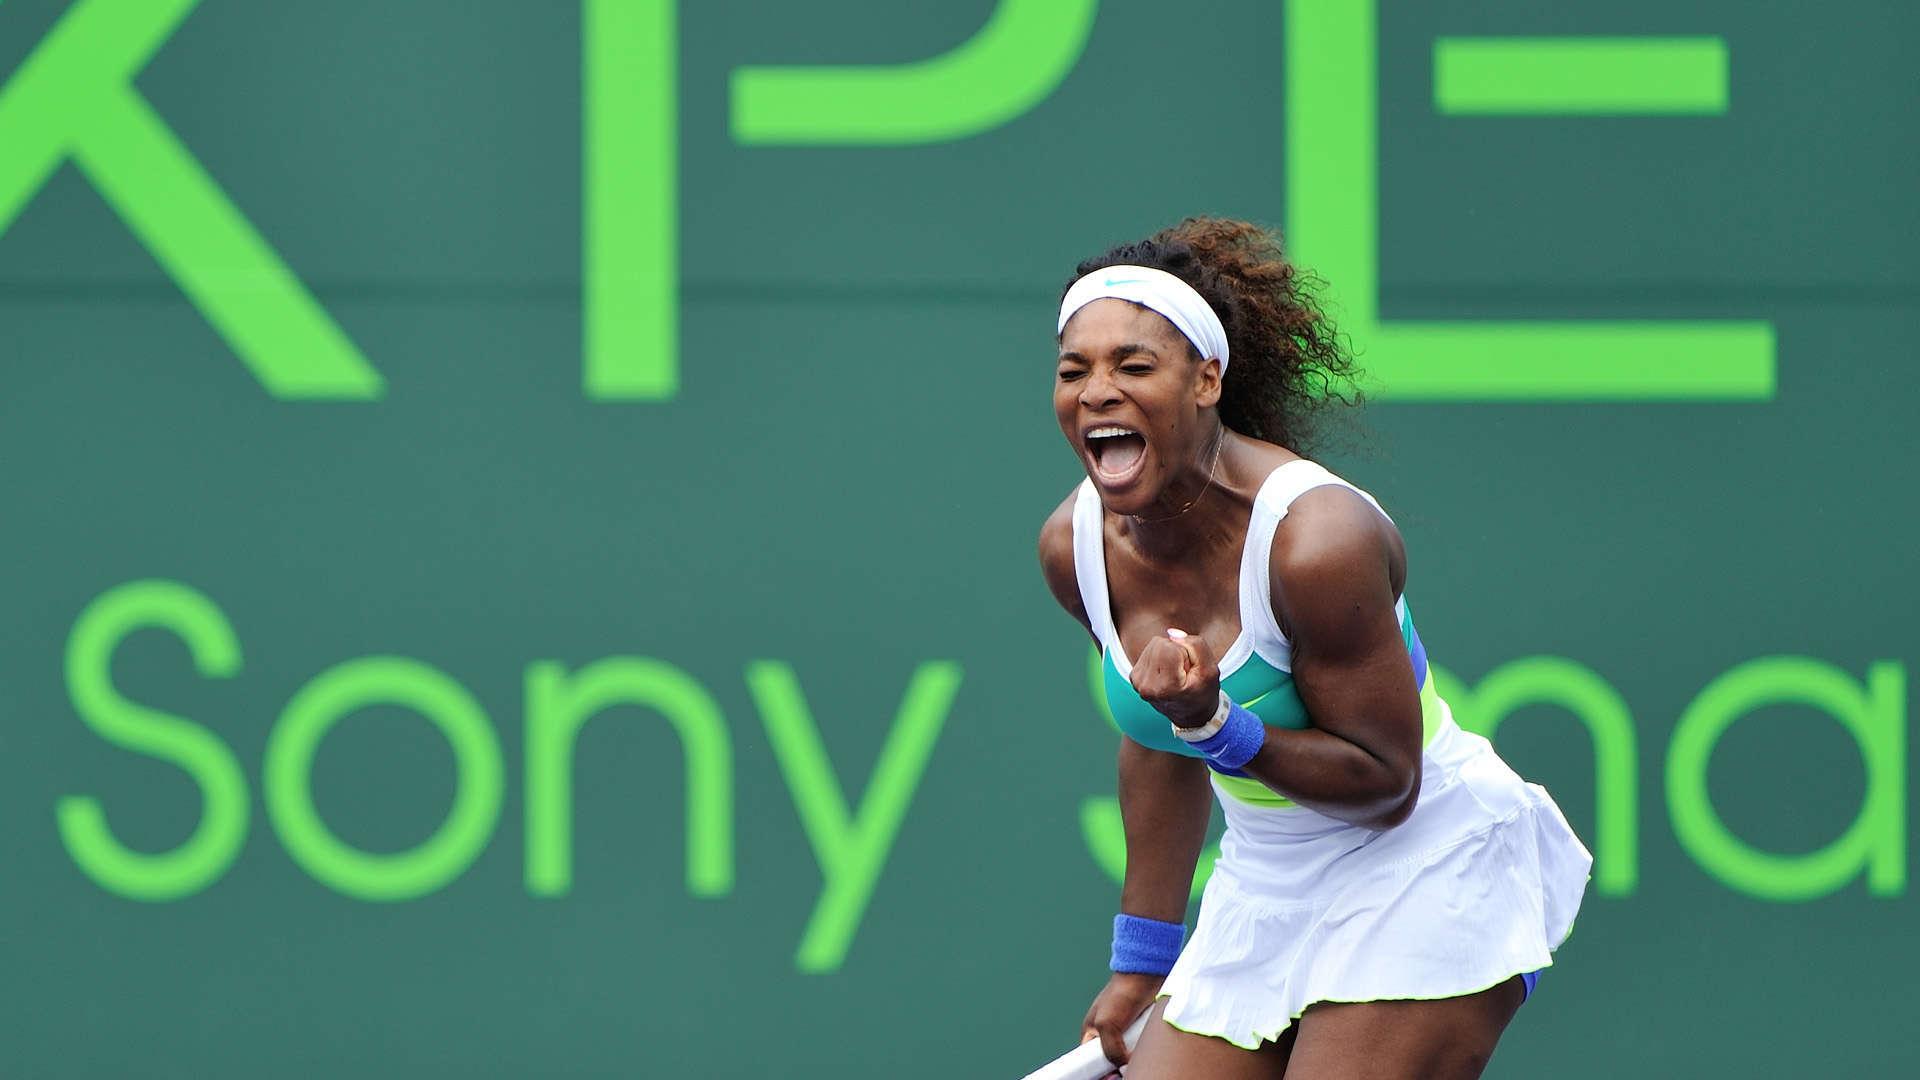 Serena Williams Wallpaper 11   1920 X 1080 stmednet 1920x1080